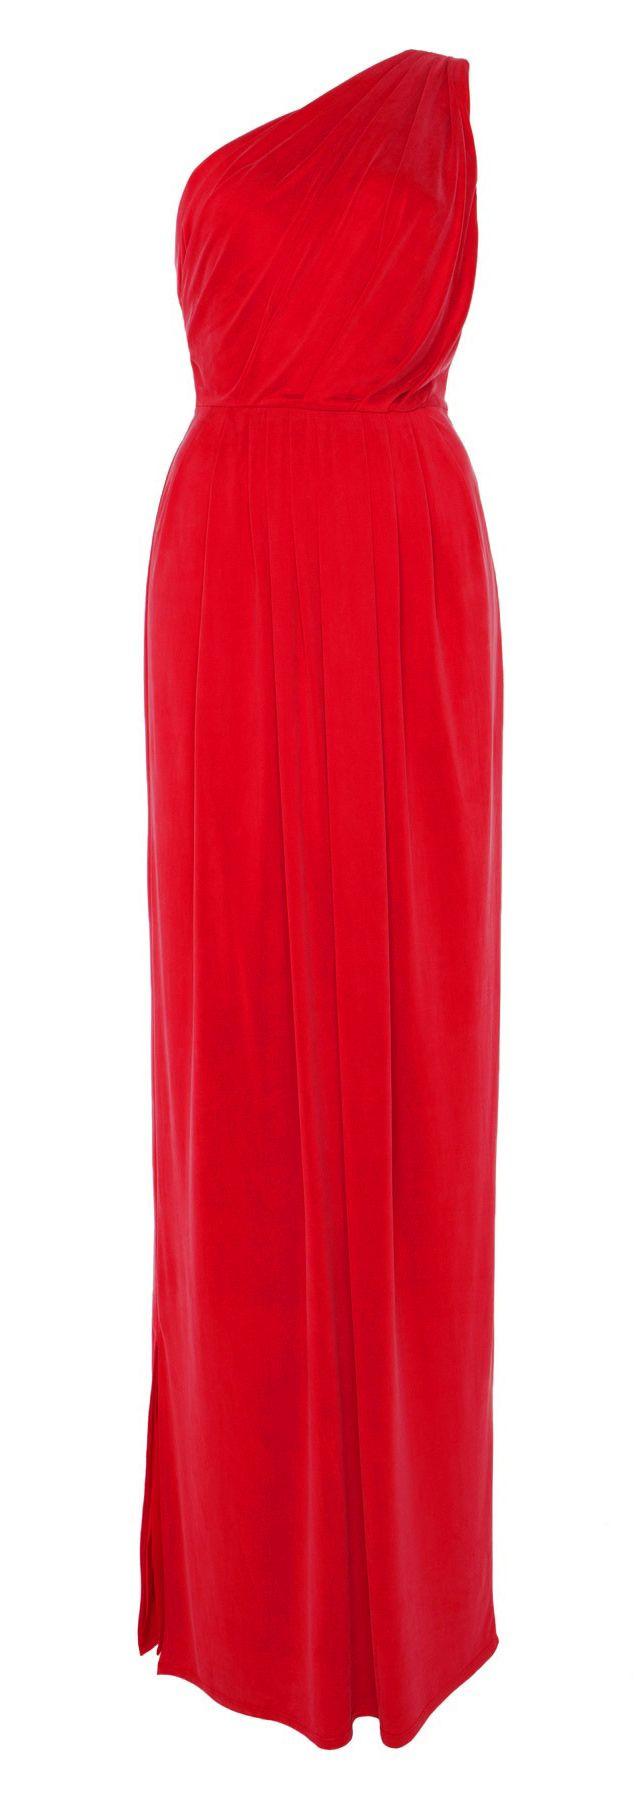 Temperley london red long annabelle jersey dress formal